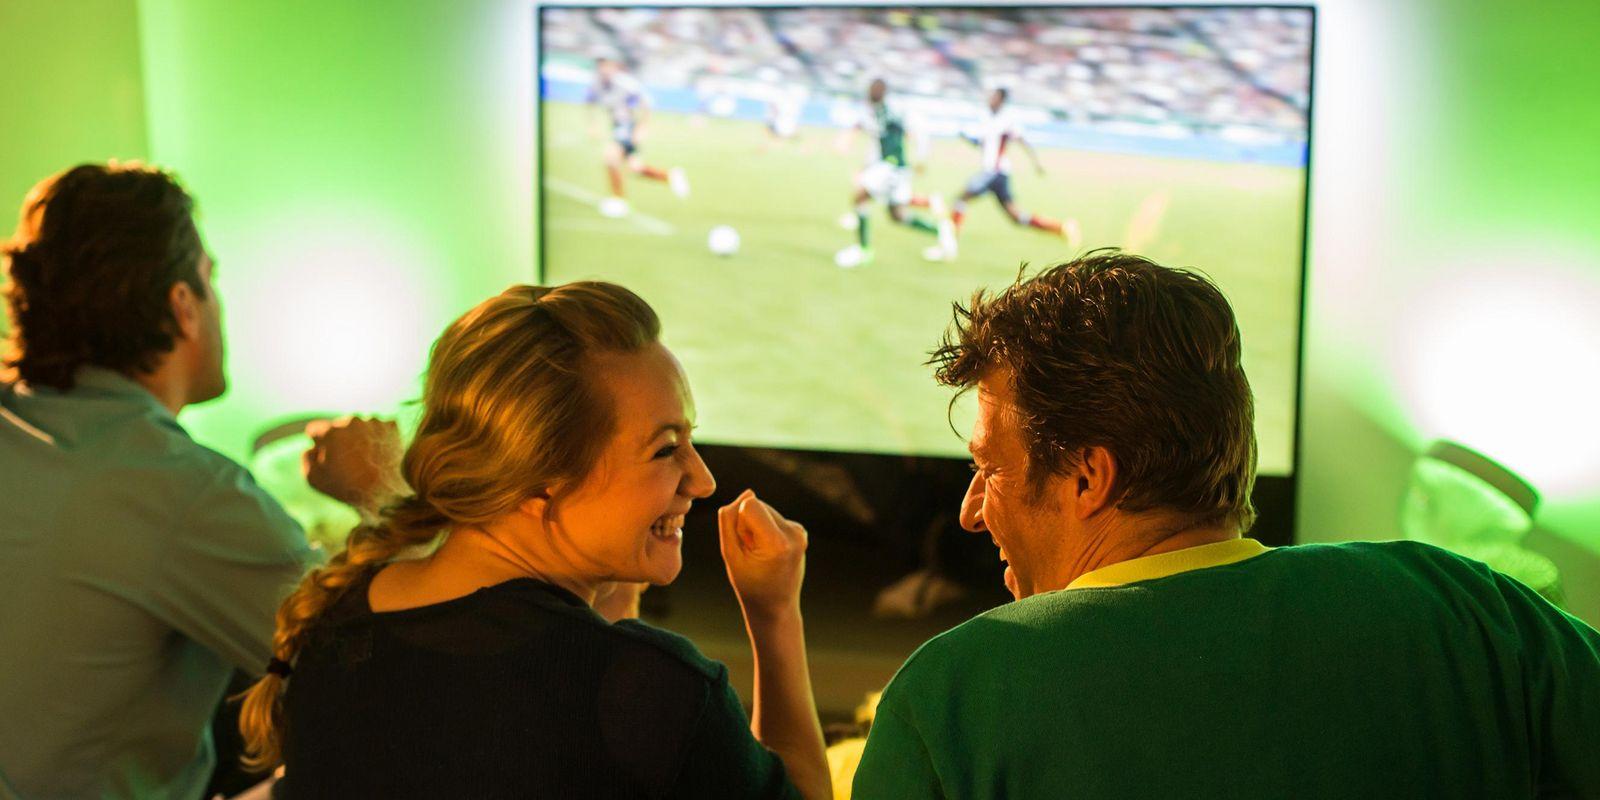 Philips Hue schafft farbige EM Beleuchtung Fußballstimmung